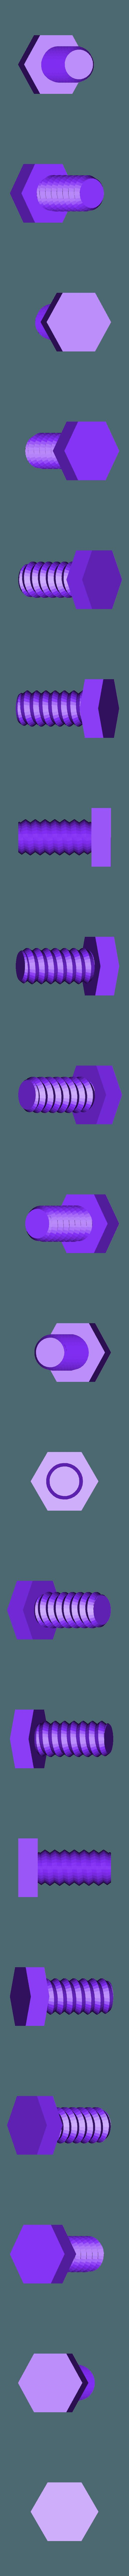 Ex03_15x30x4.stl Download free SCAD file Poor man's openscad screw library • Model to 3D print, Wachet